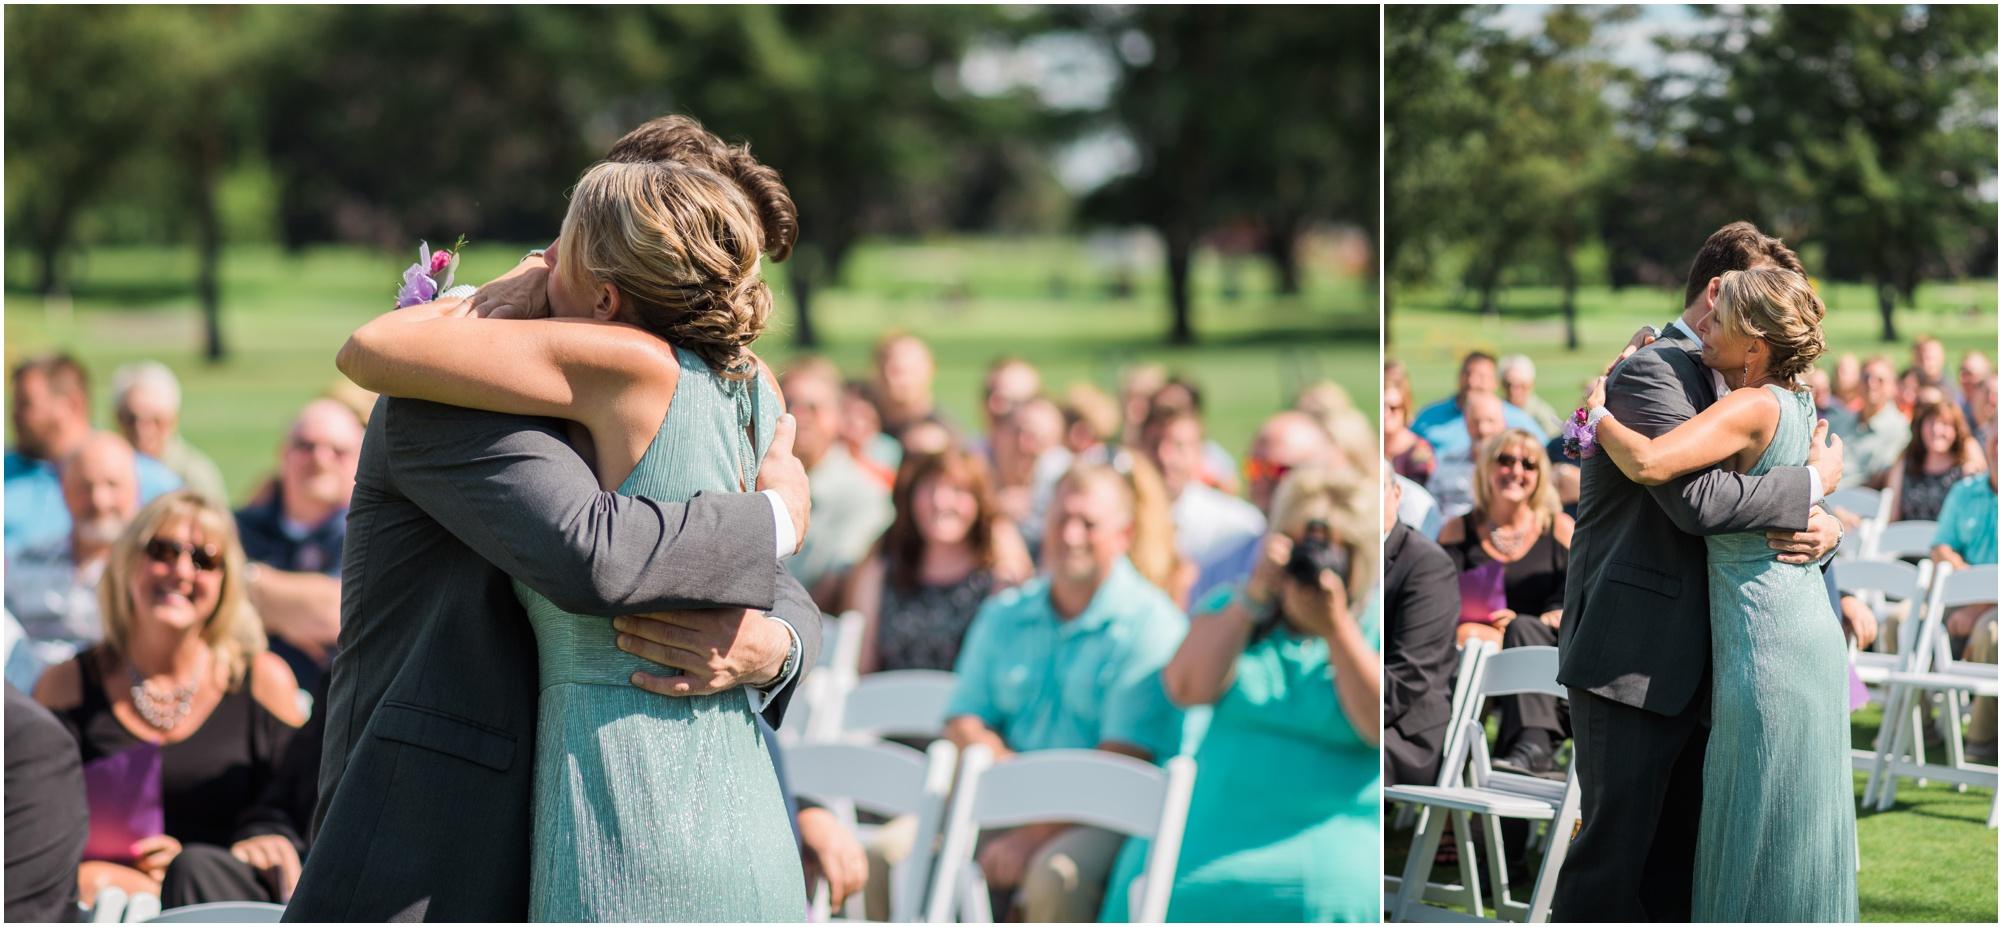 Wisconsin-Wedding-Photographer-Reedsburg-Country-Club-Kaela-and Matt-Wedding-356.jpg